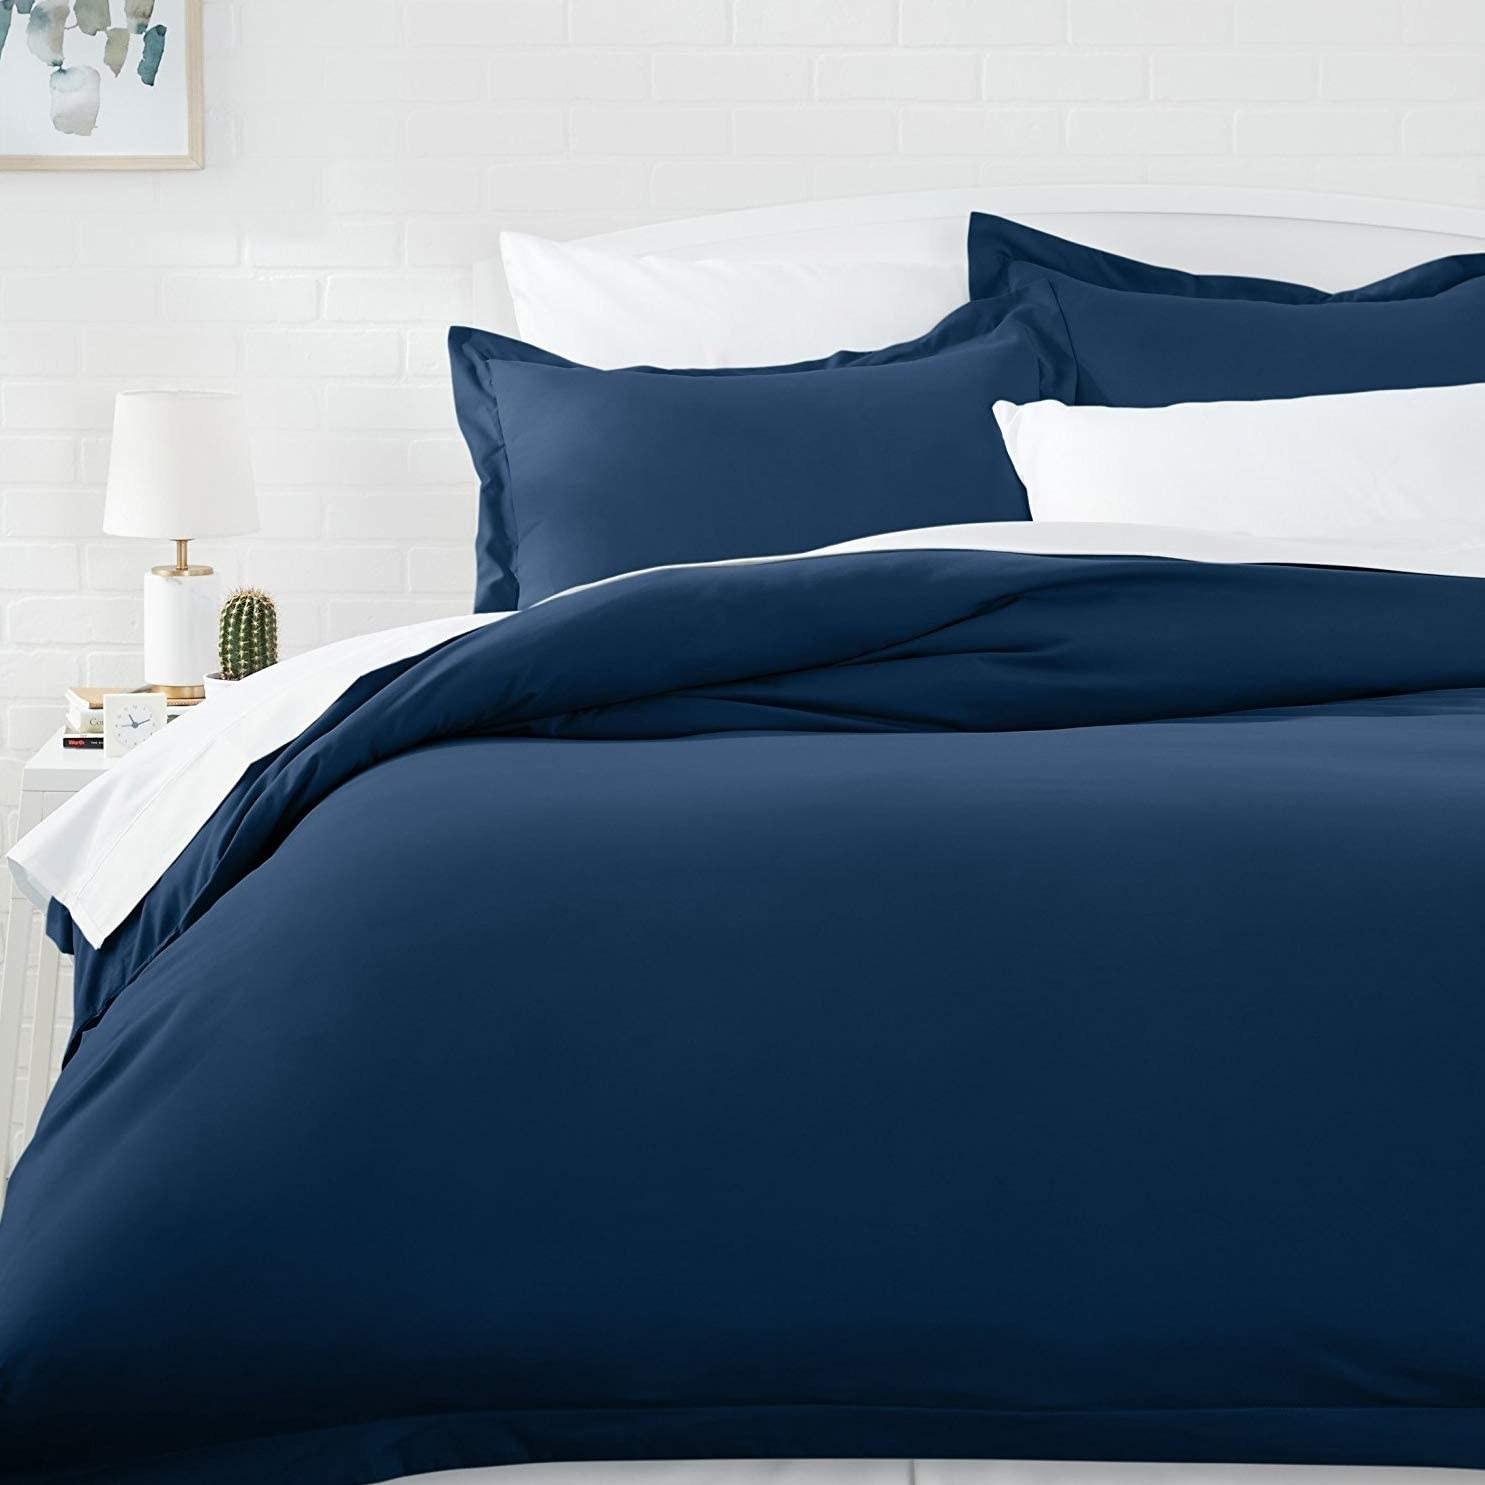 A blue microfiber duvet cover